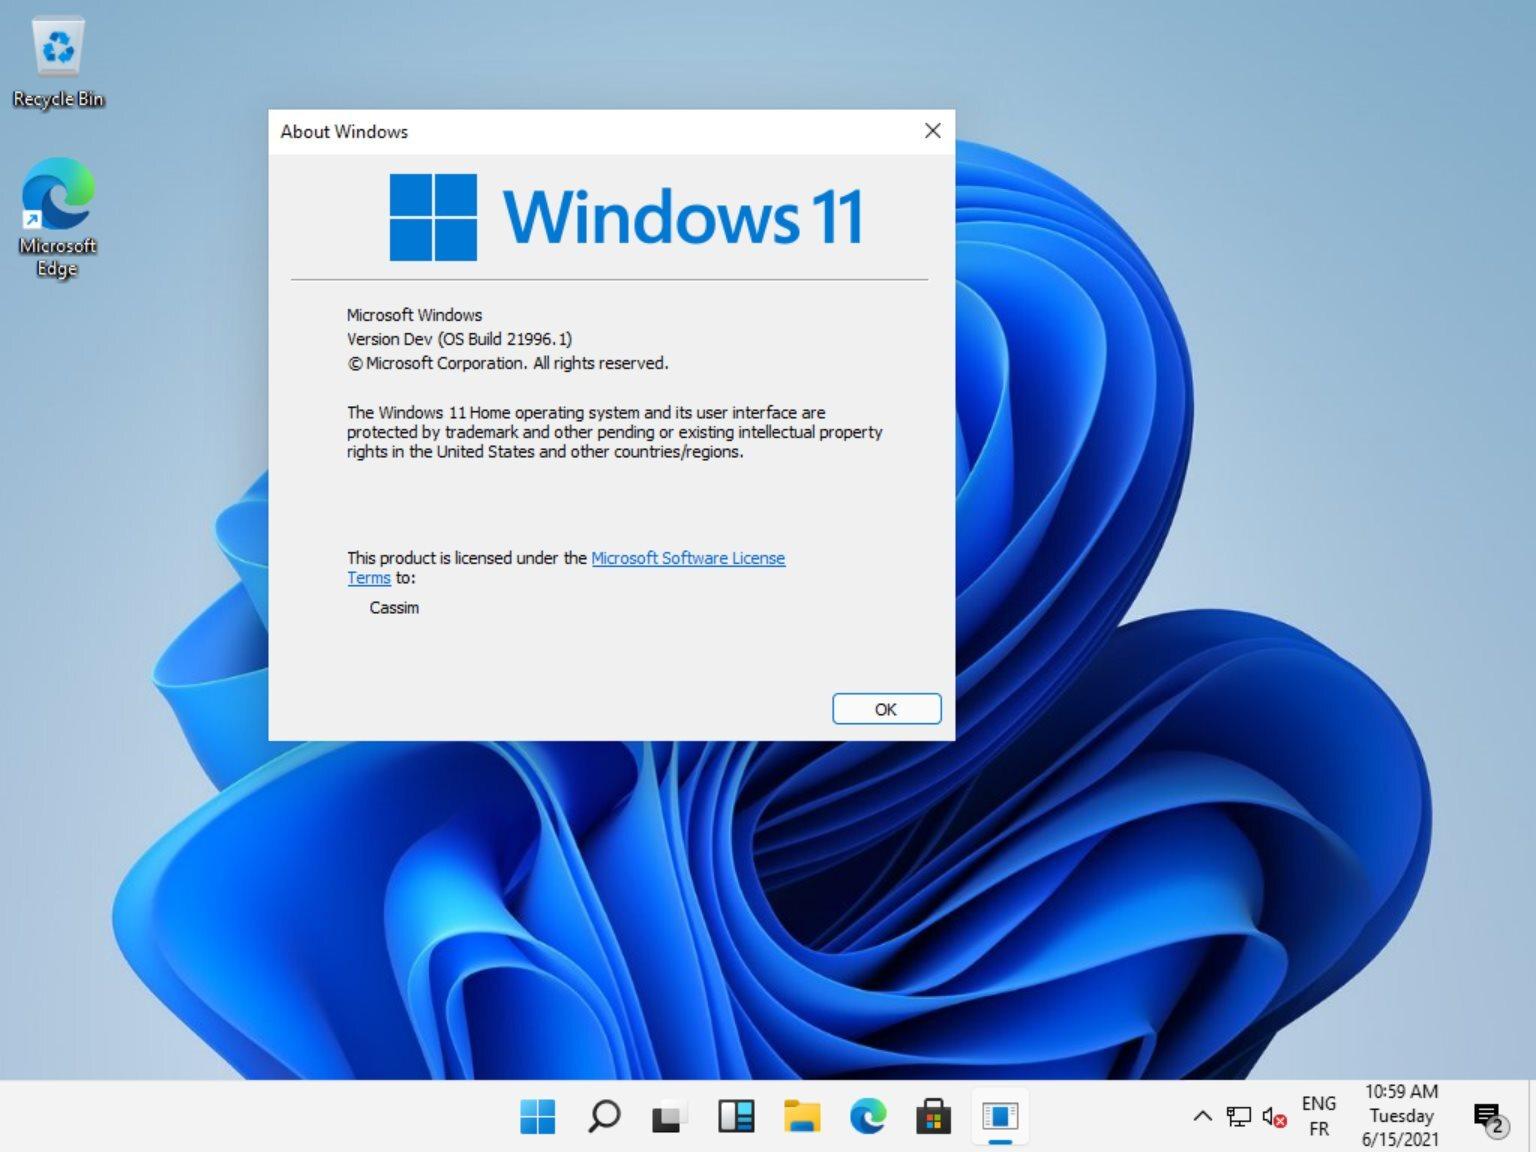 https://images.frandroid.com/wp-content/uploads/2021/06/windows-11-sun-valley-screenshot-frandroid-1.jpg